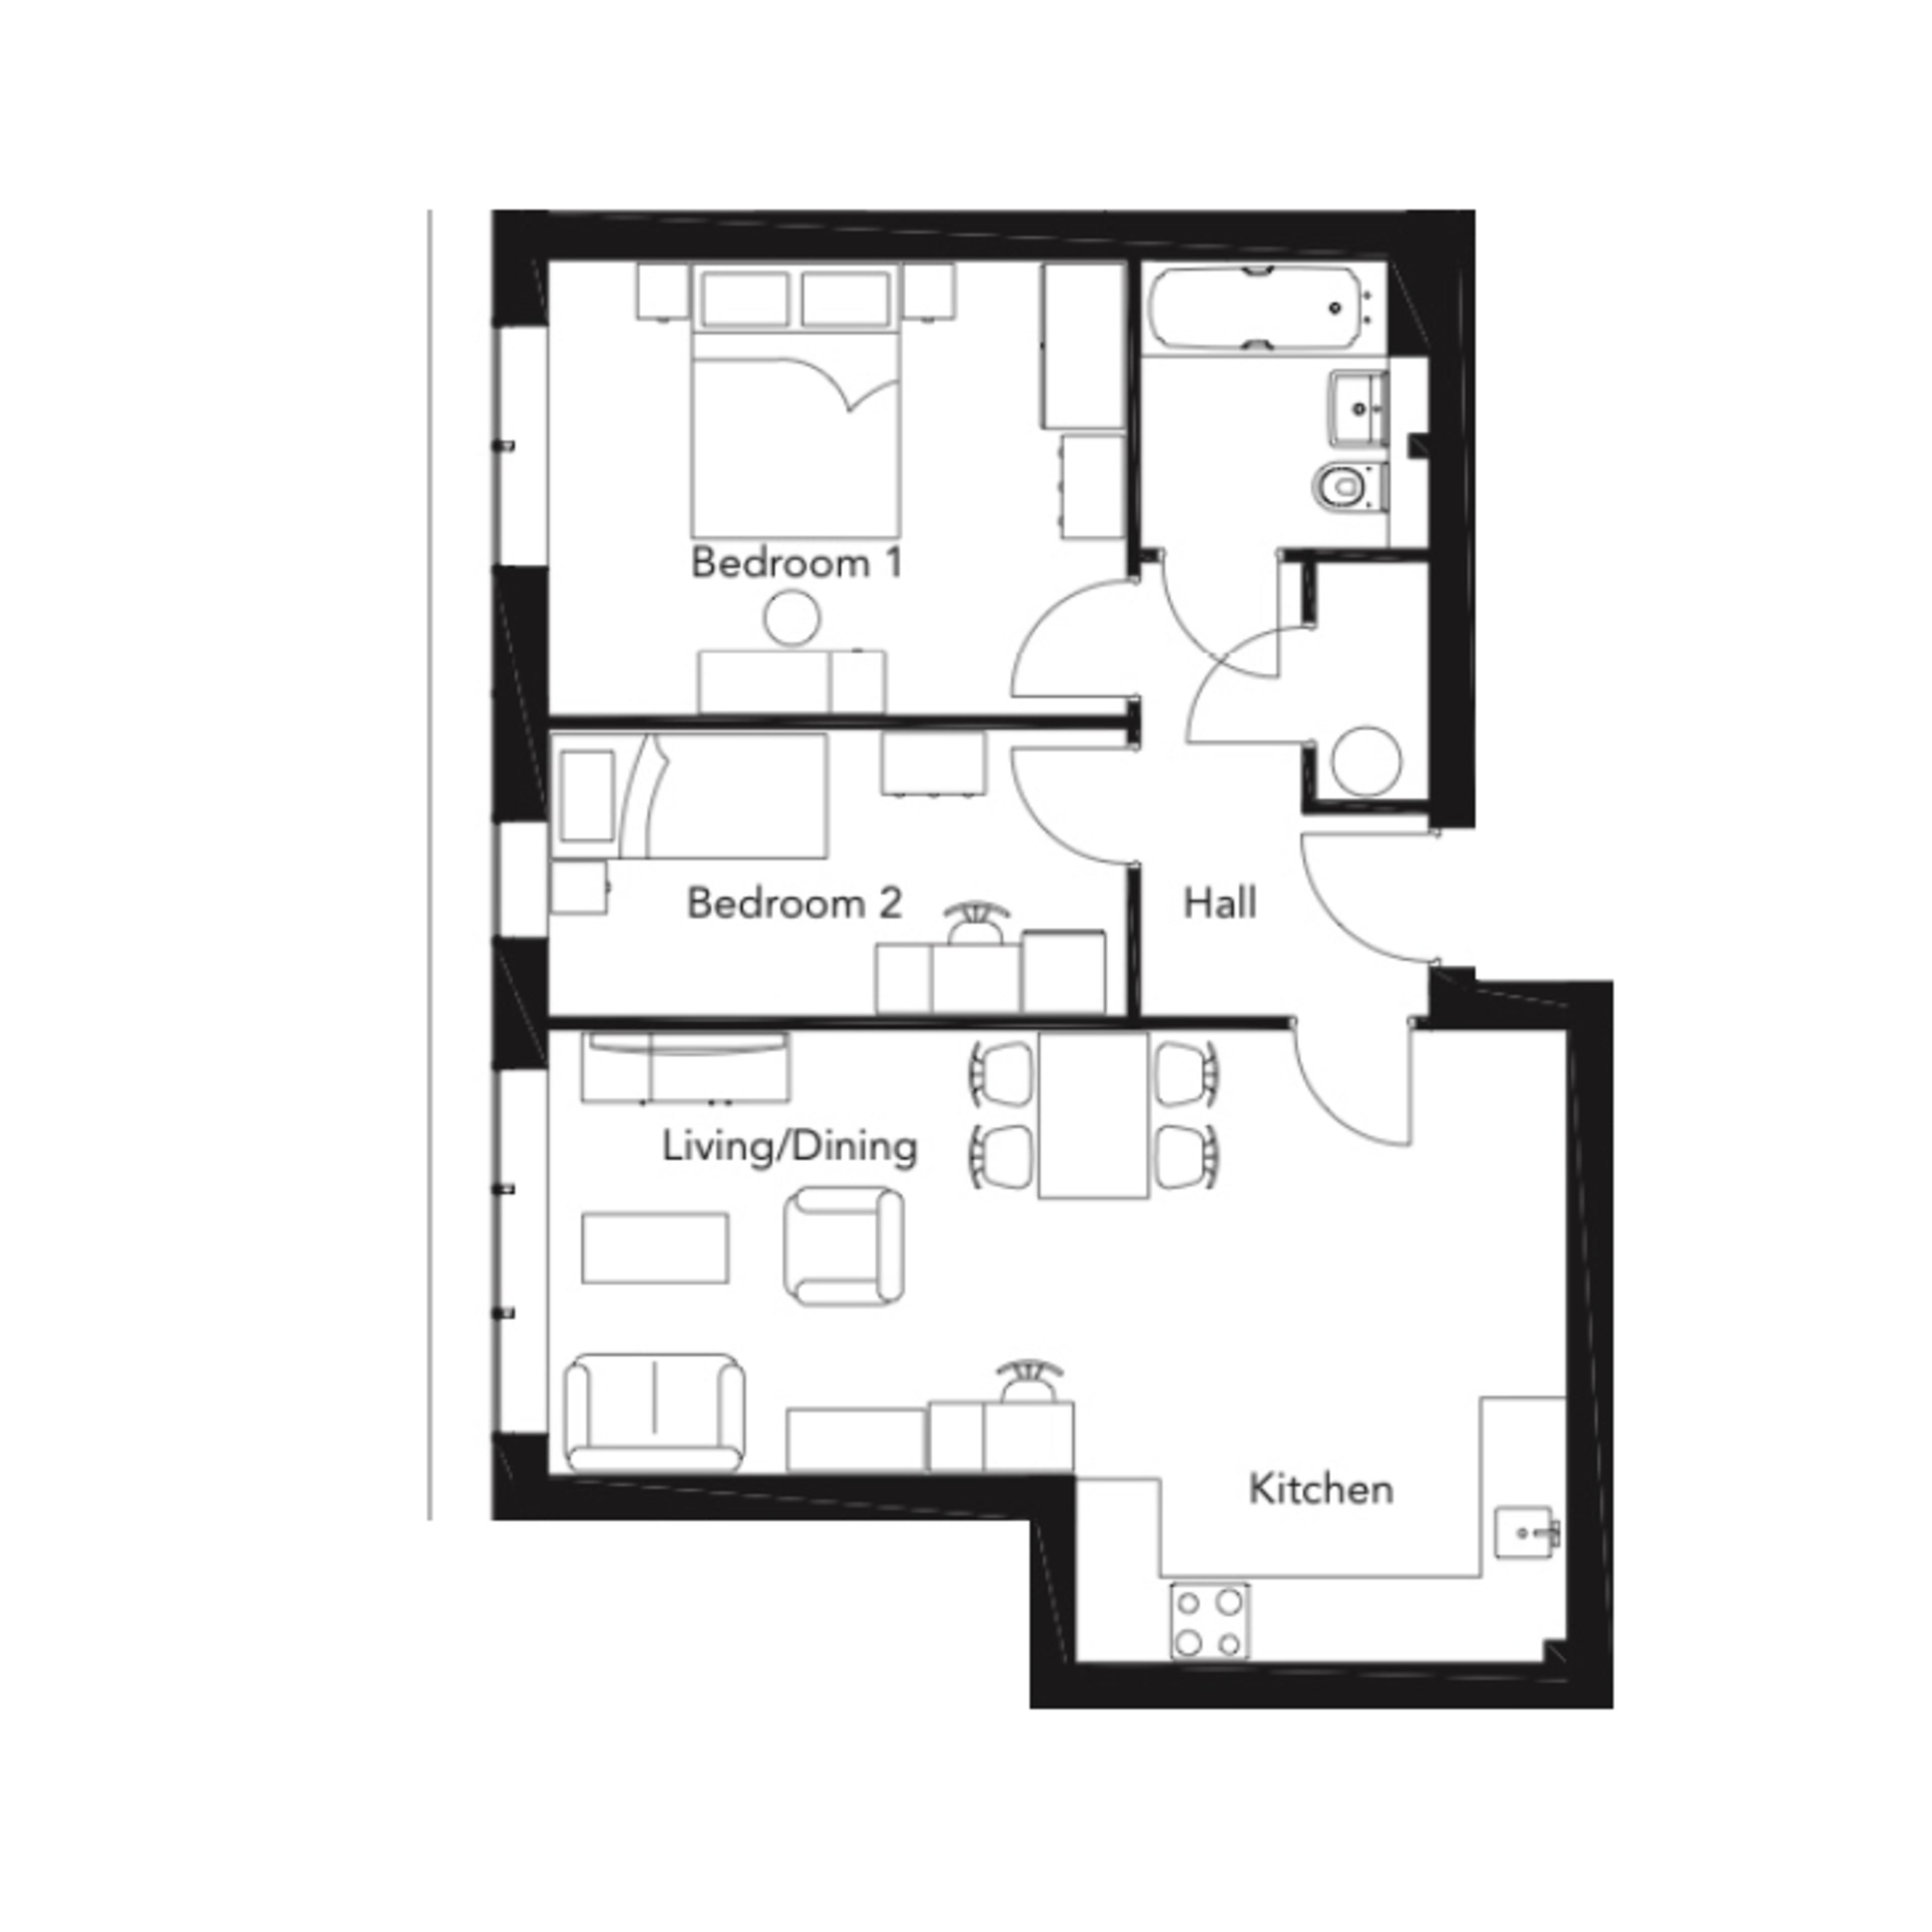 Franklin Court - 2 bedroom apartment - type M - floorplan